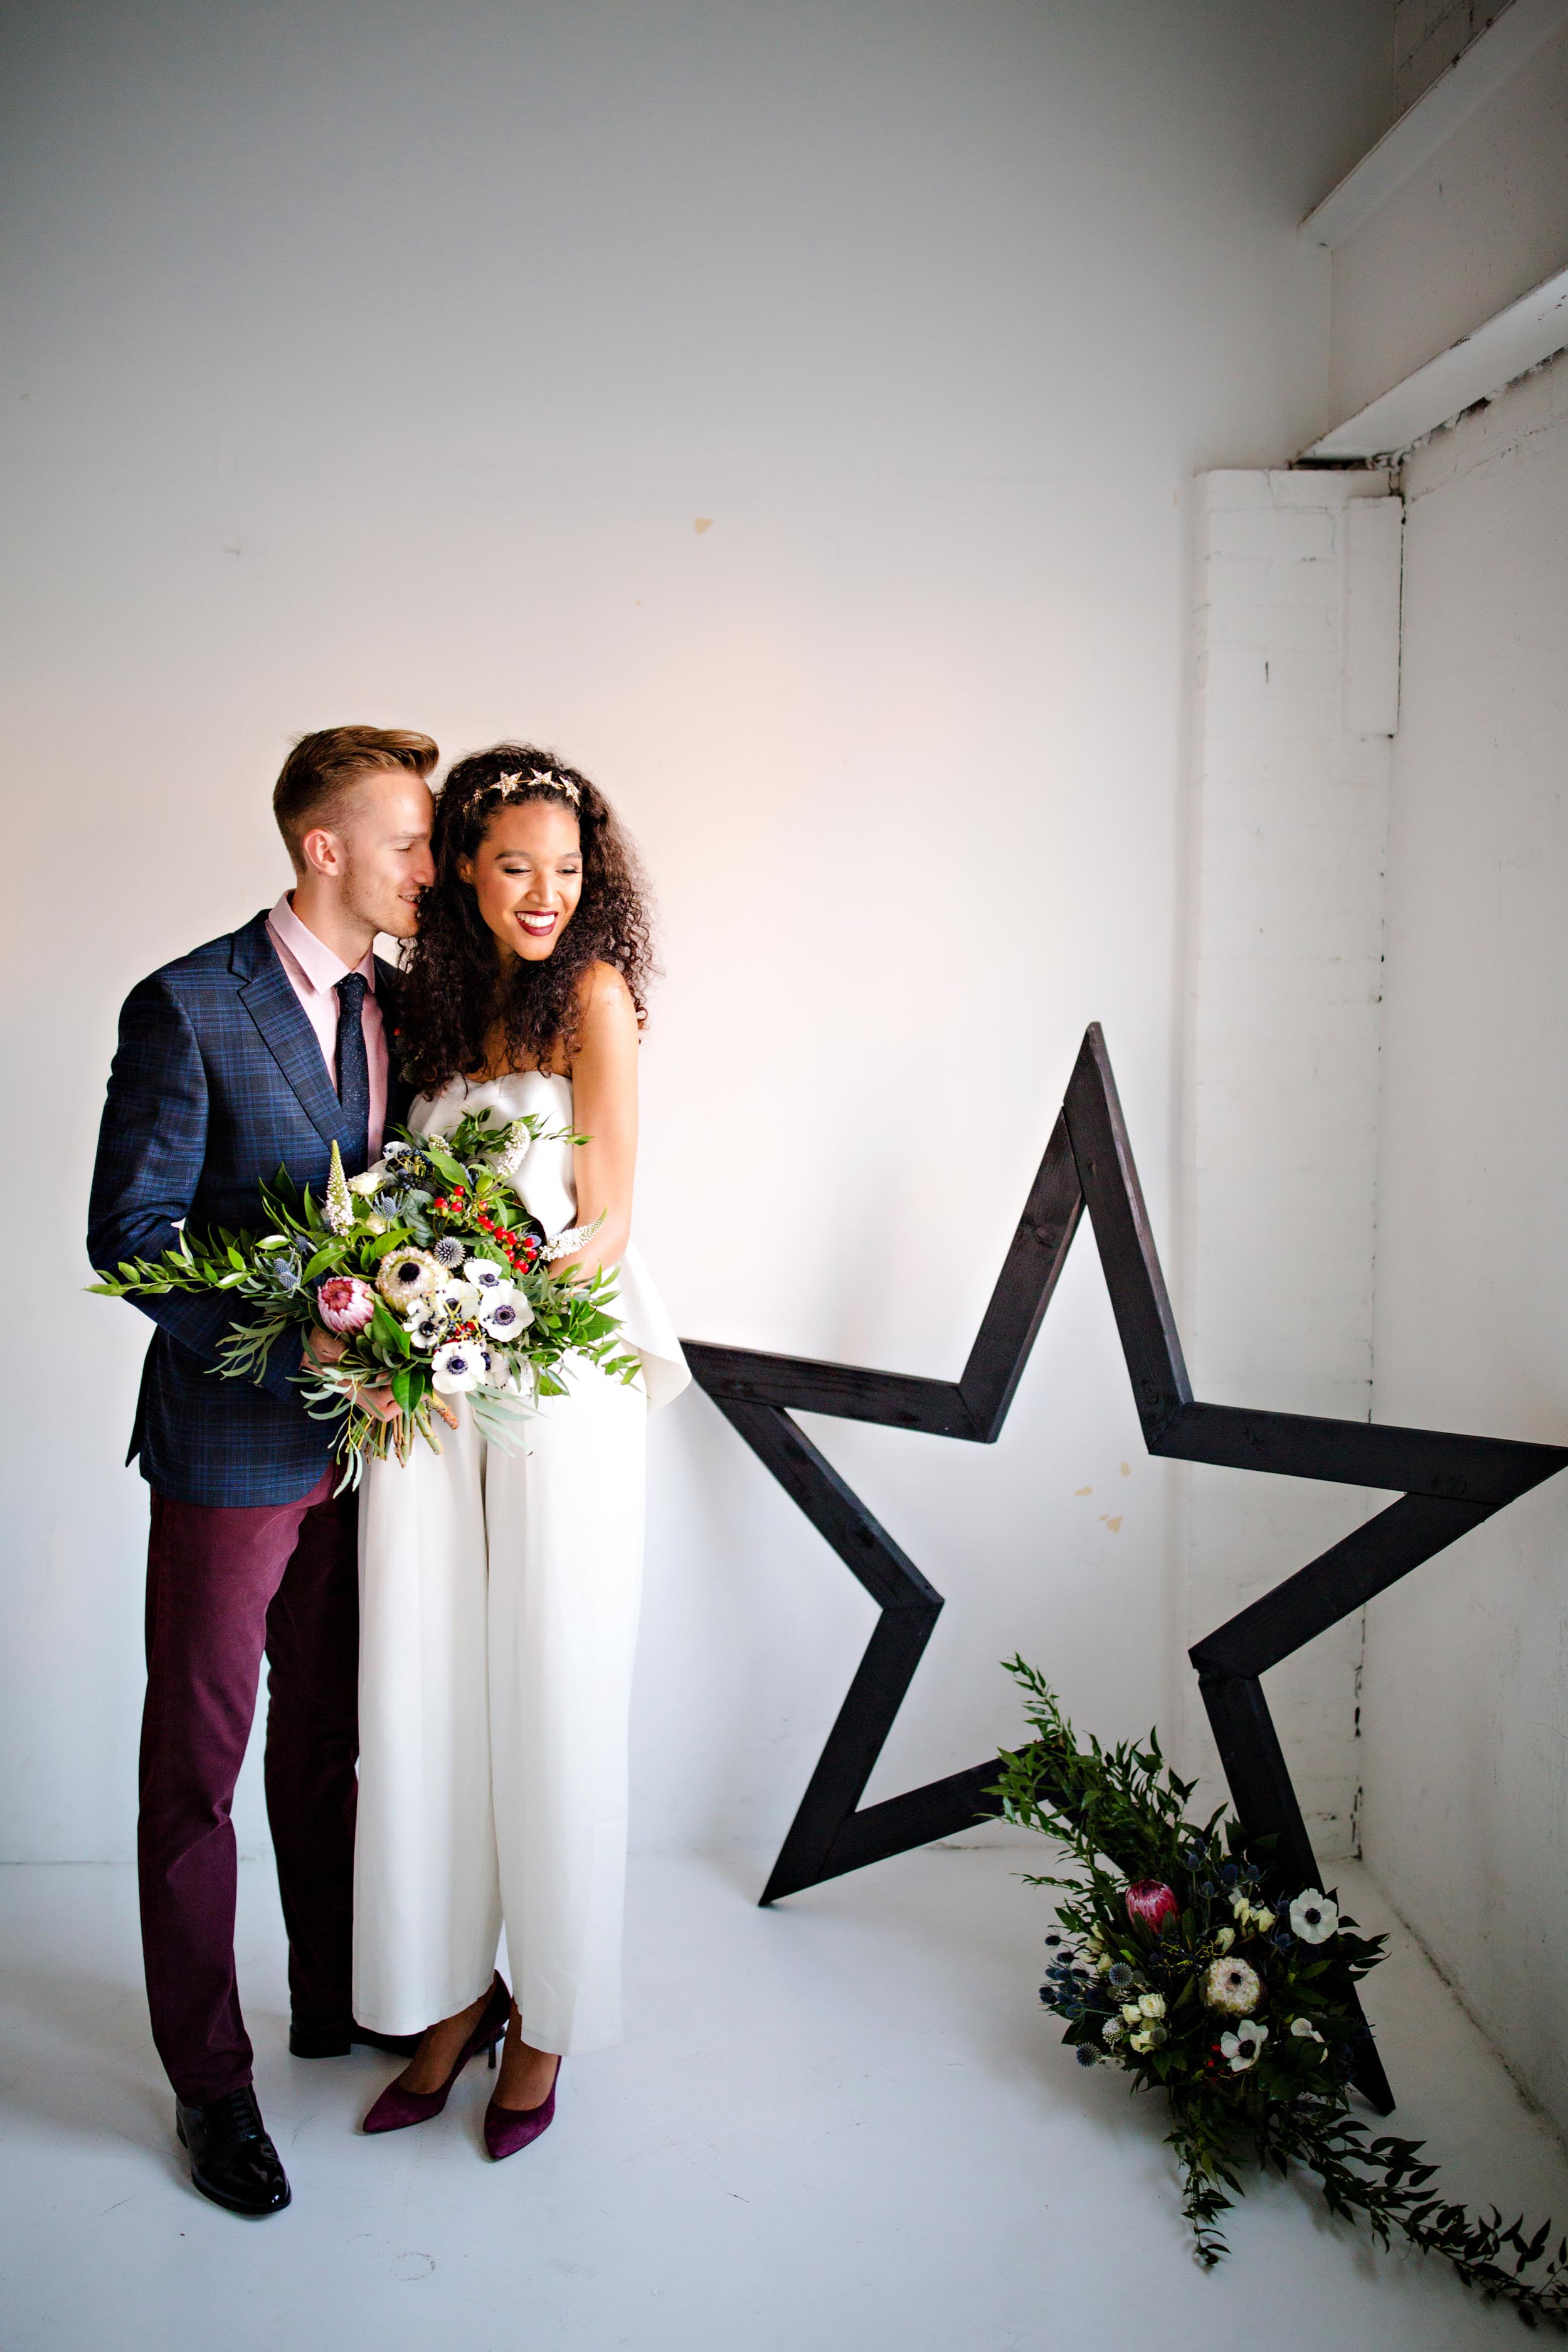 weddings-starsstripes-30.jpg